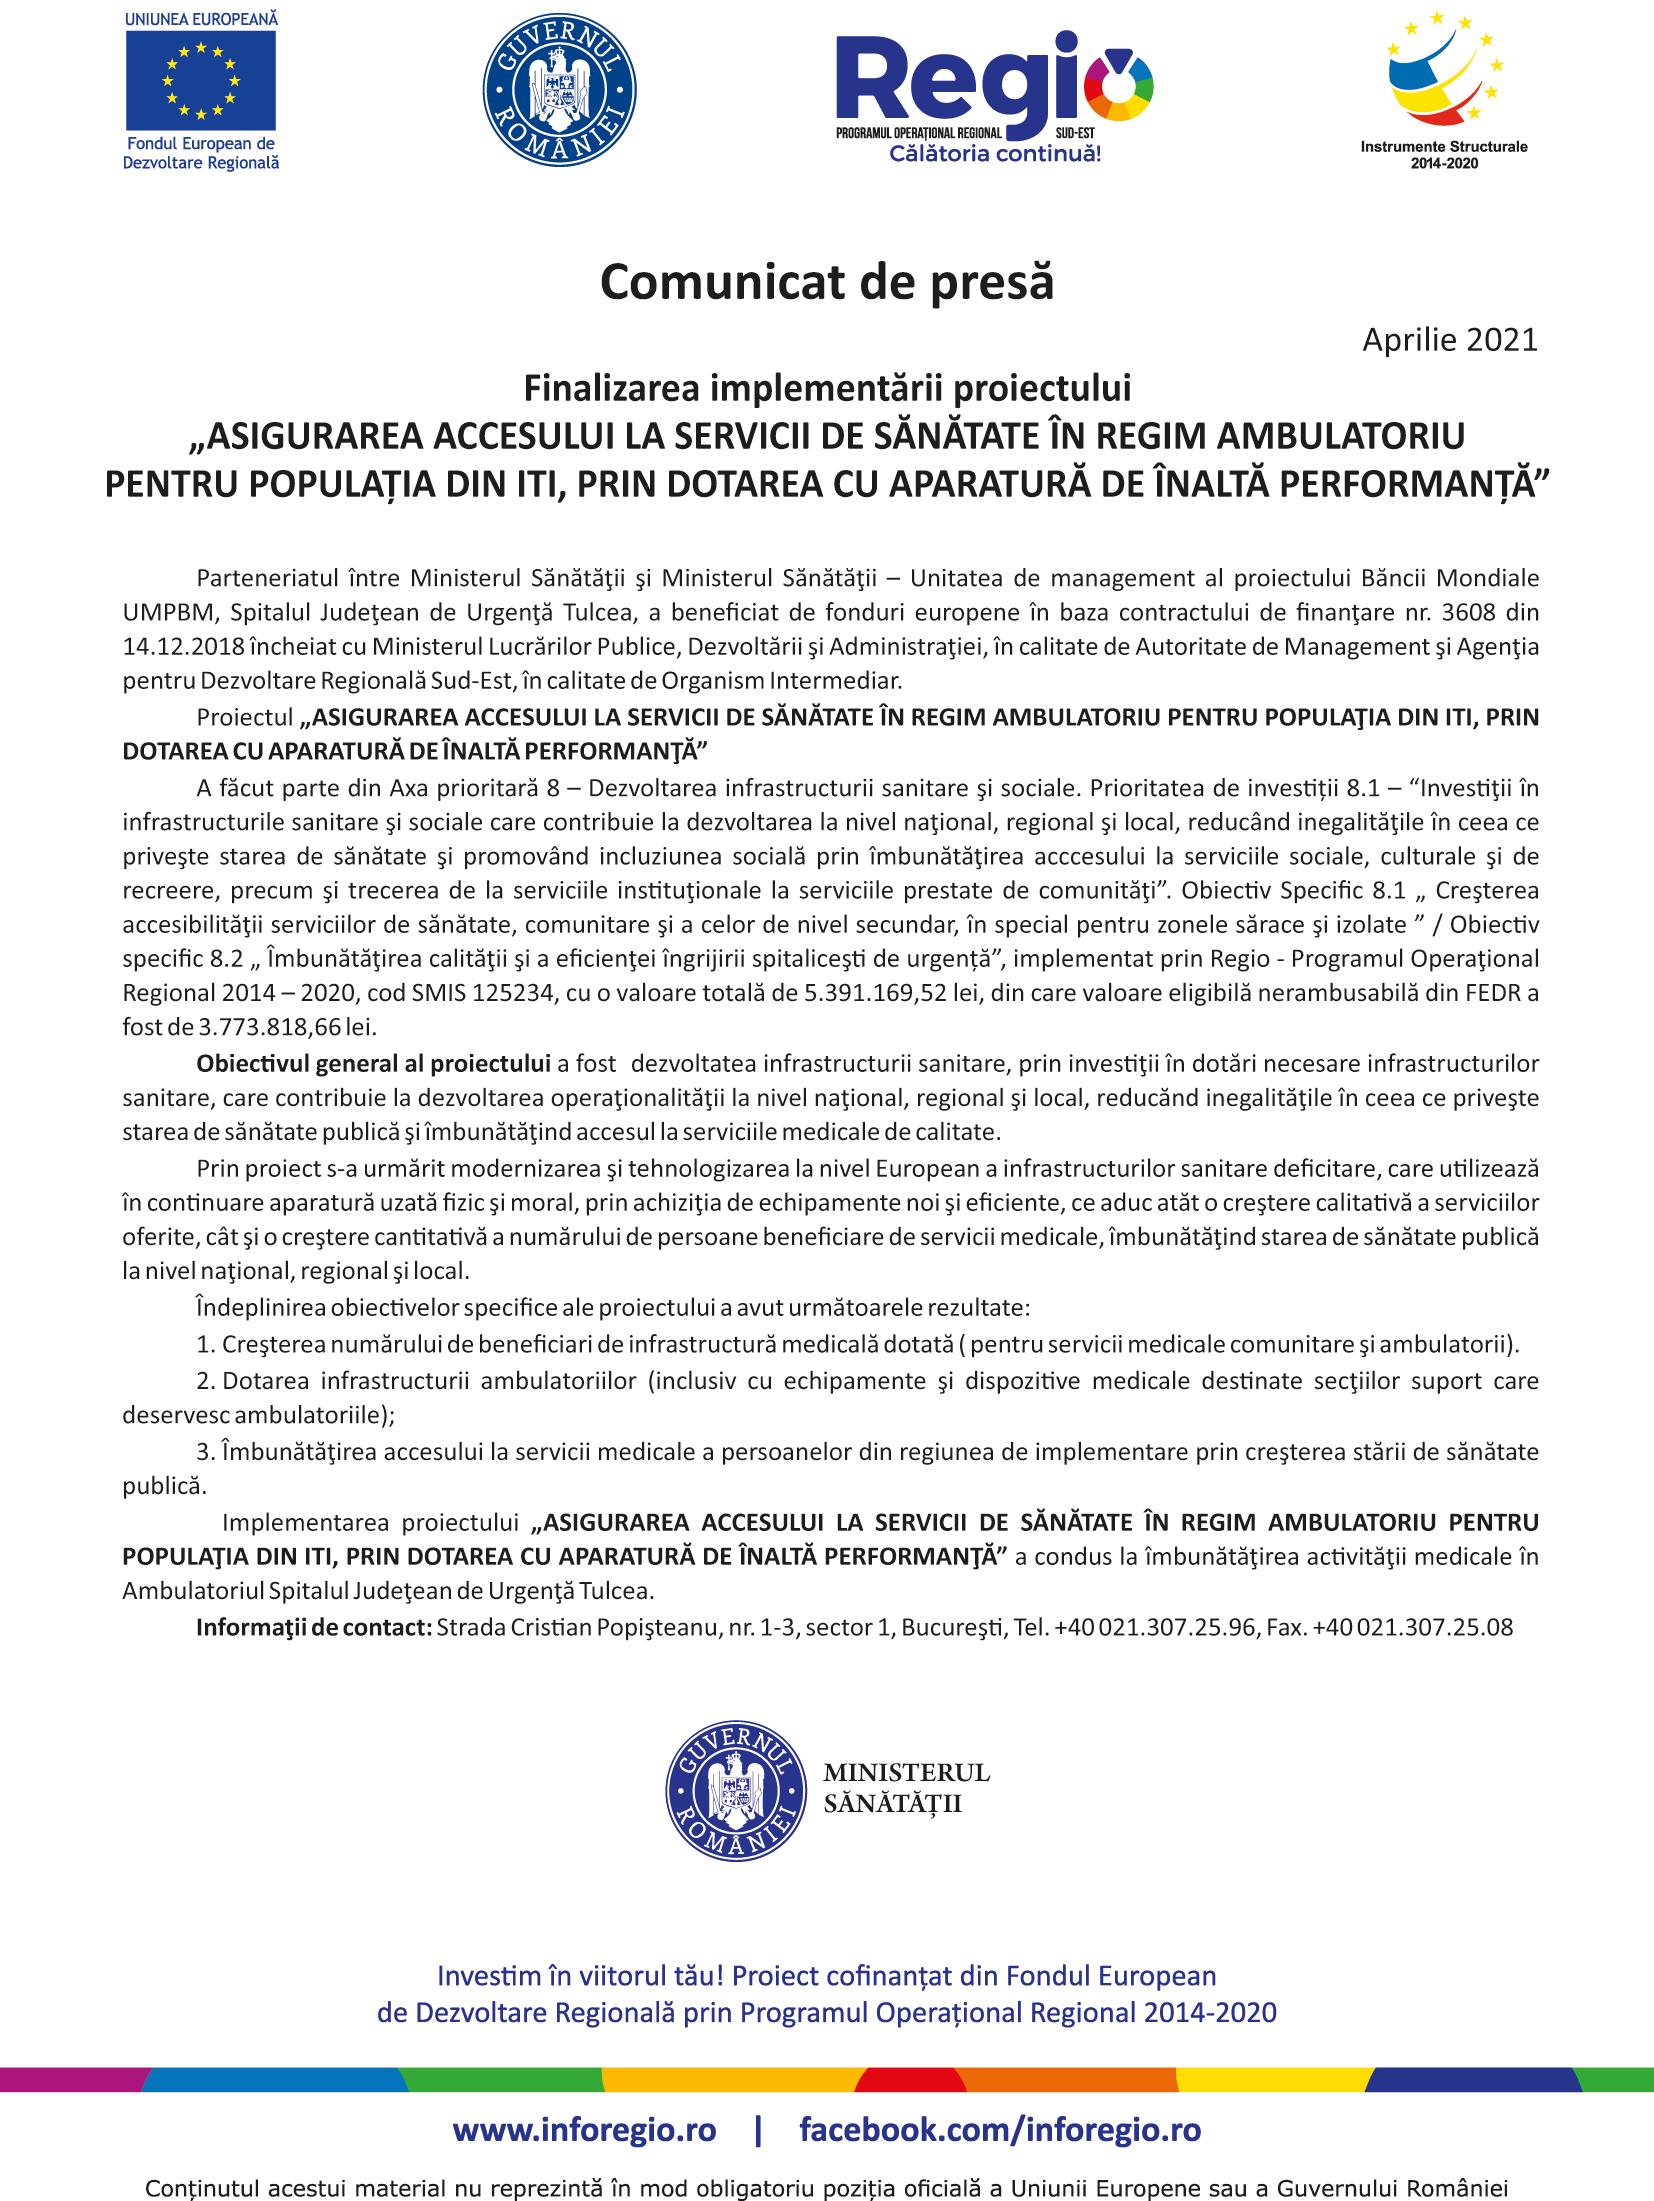 comunicat-presa-ministerul-sanatatii-inchidere-proiect-125234-(1)